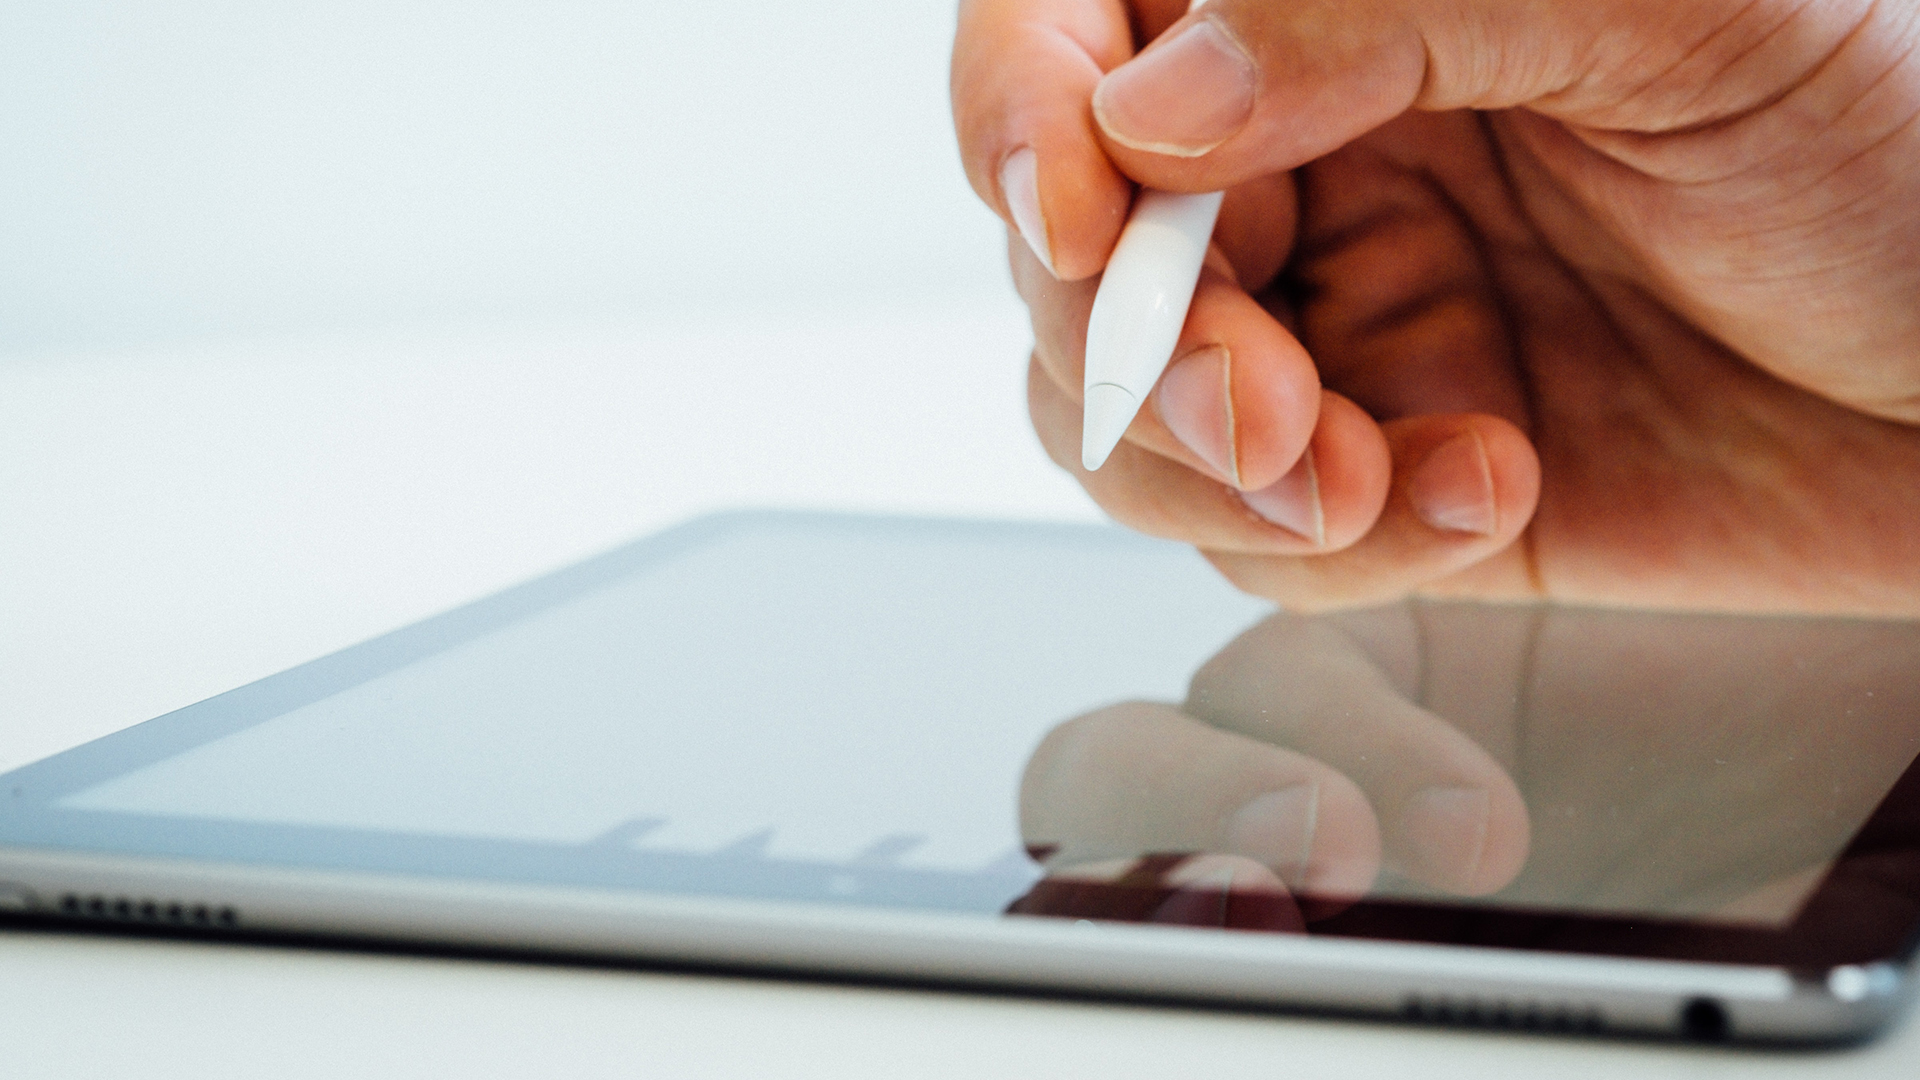 Apple iPad e una Apple Pencil